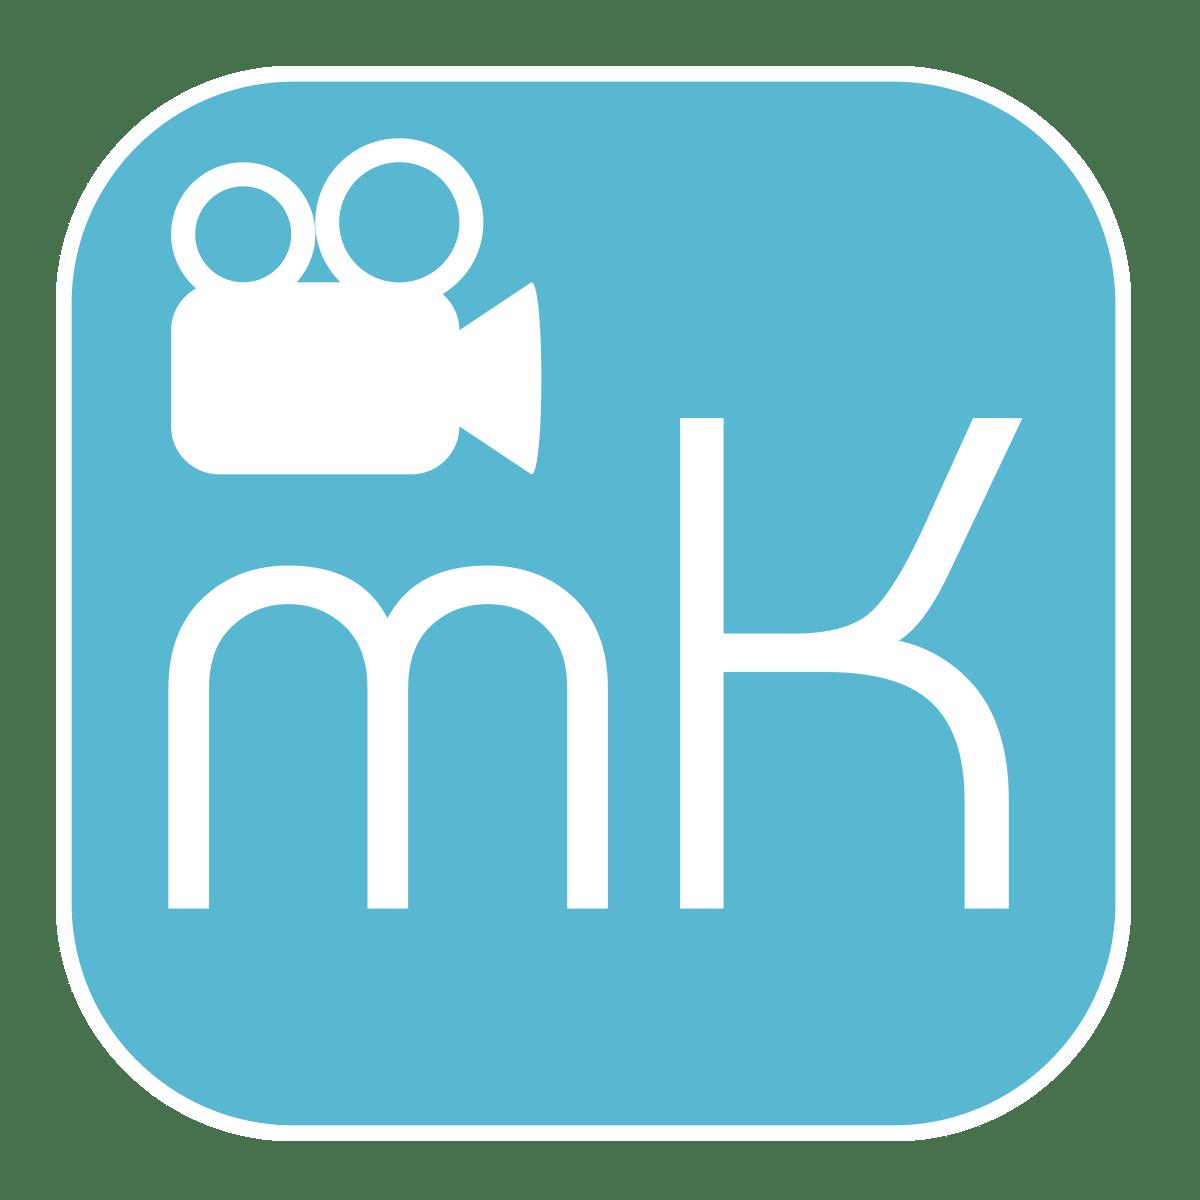 MK Fotografie | Videoproduktion